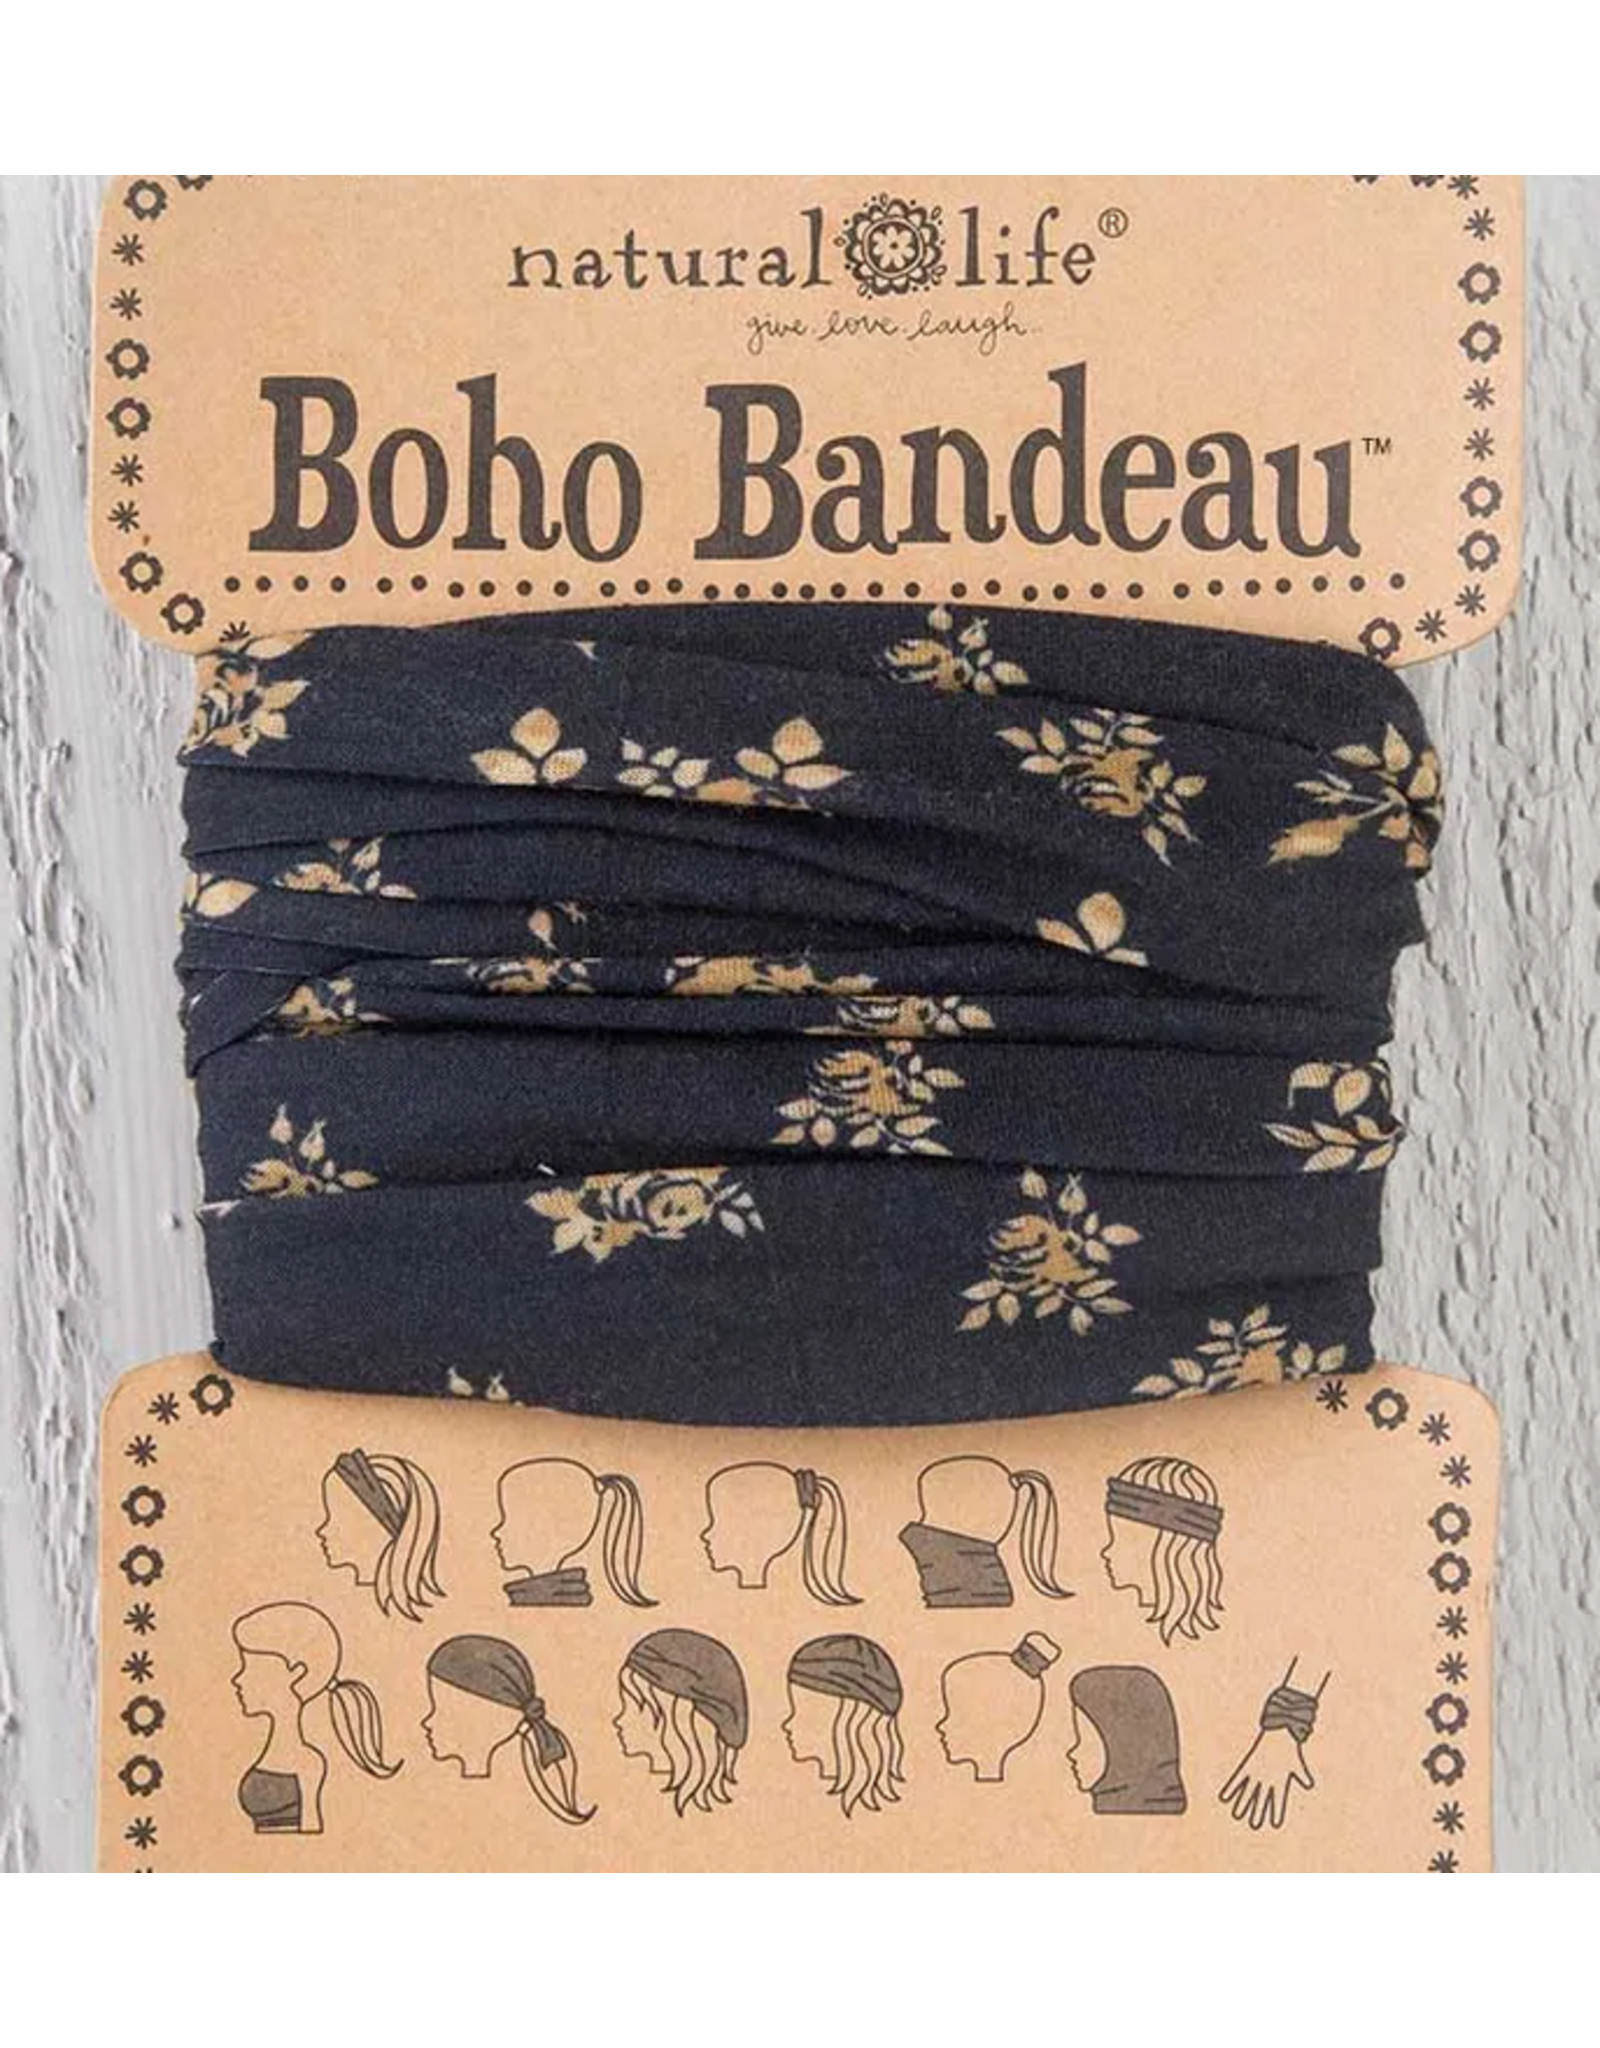 Natural LIfe Boho Bandeau, Black and Cream Floral